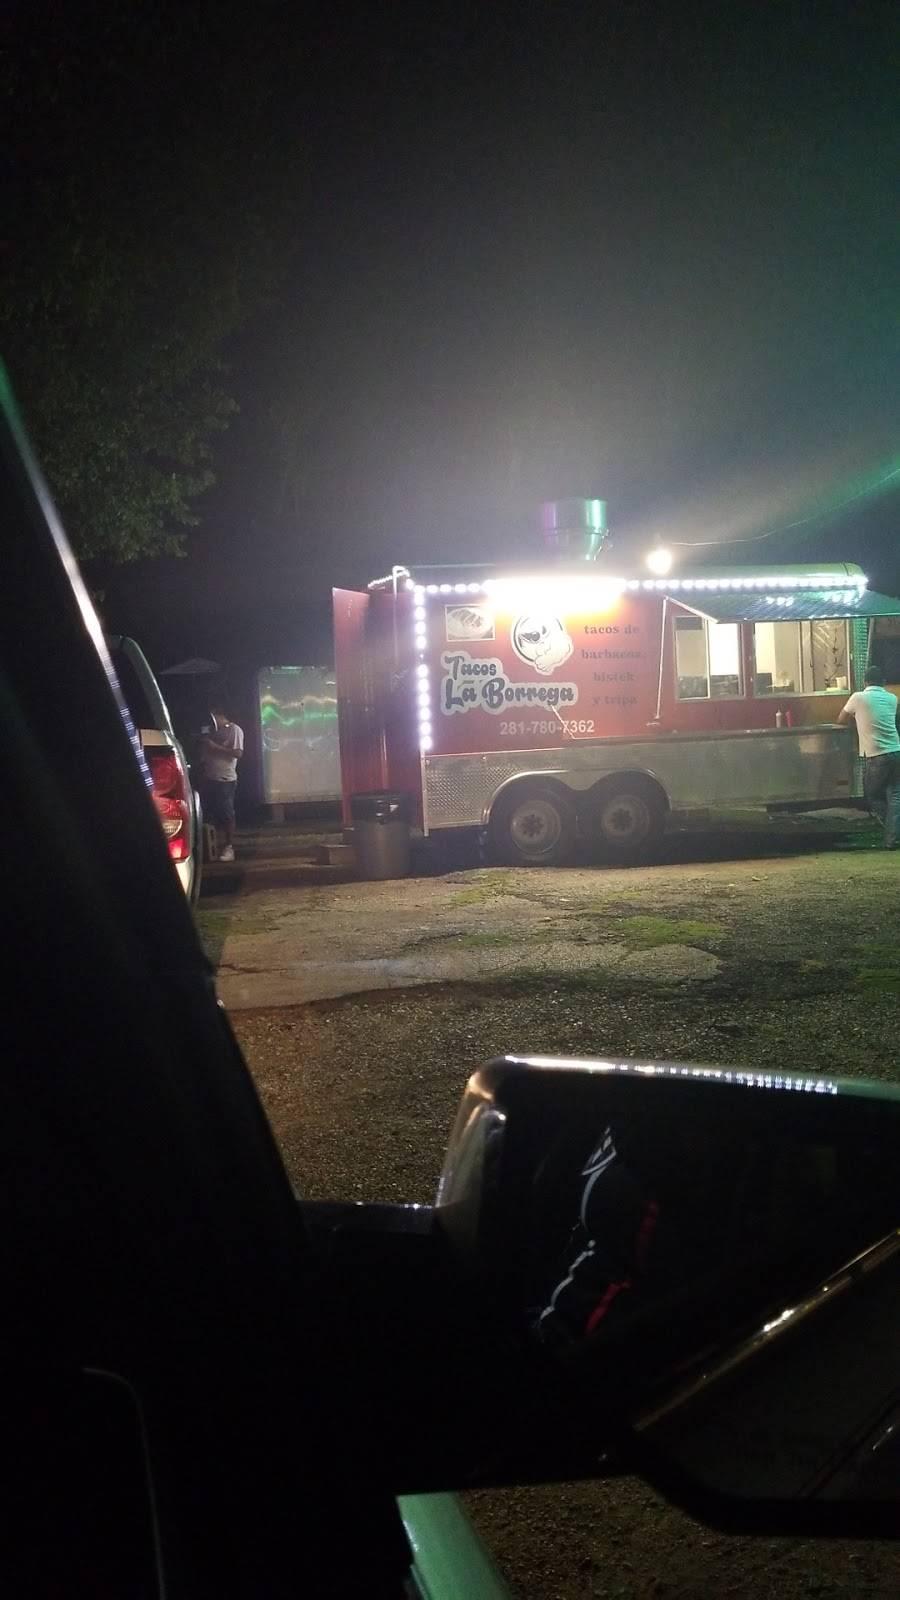 Tacos La Borrega | restaurant | 0250930000016, Houston, TX 77012, USA | 2817807362 OR +1 281-780-7362